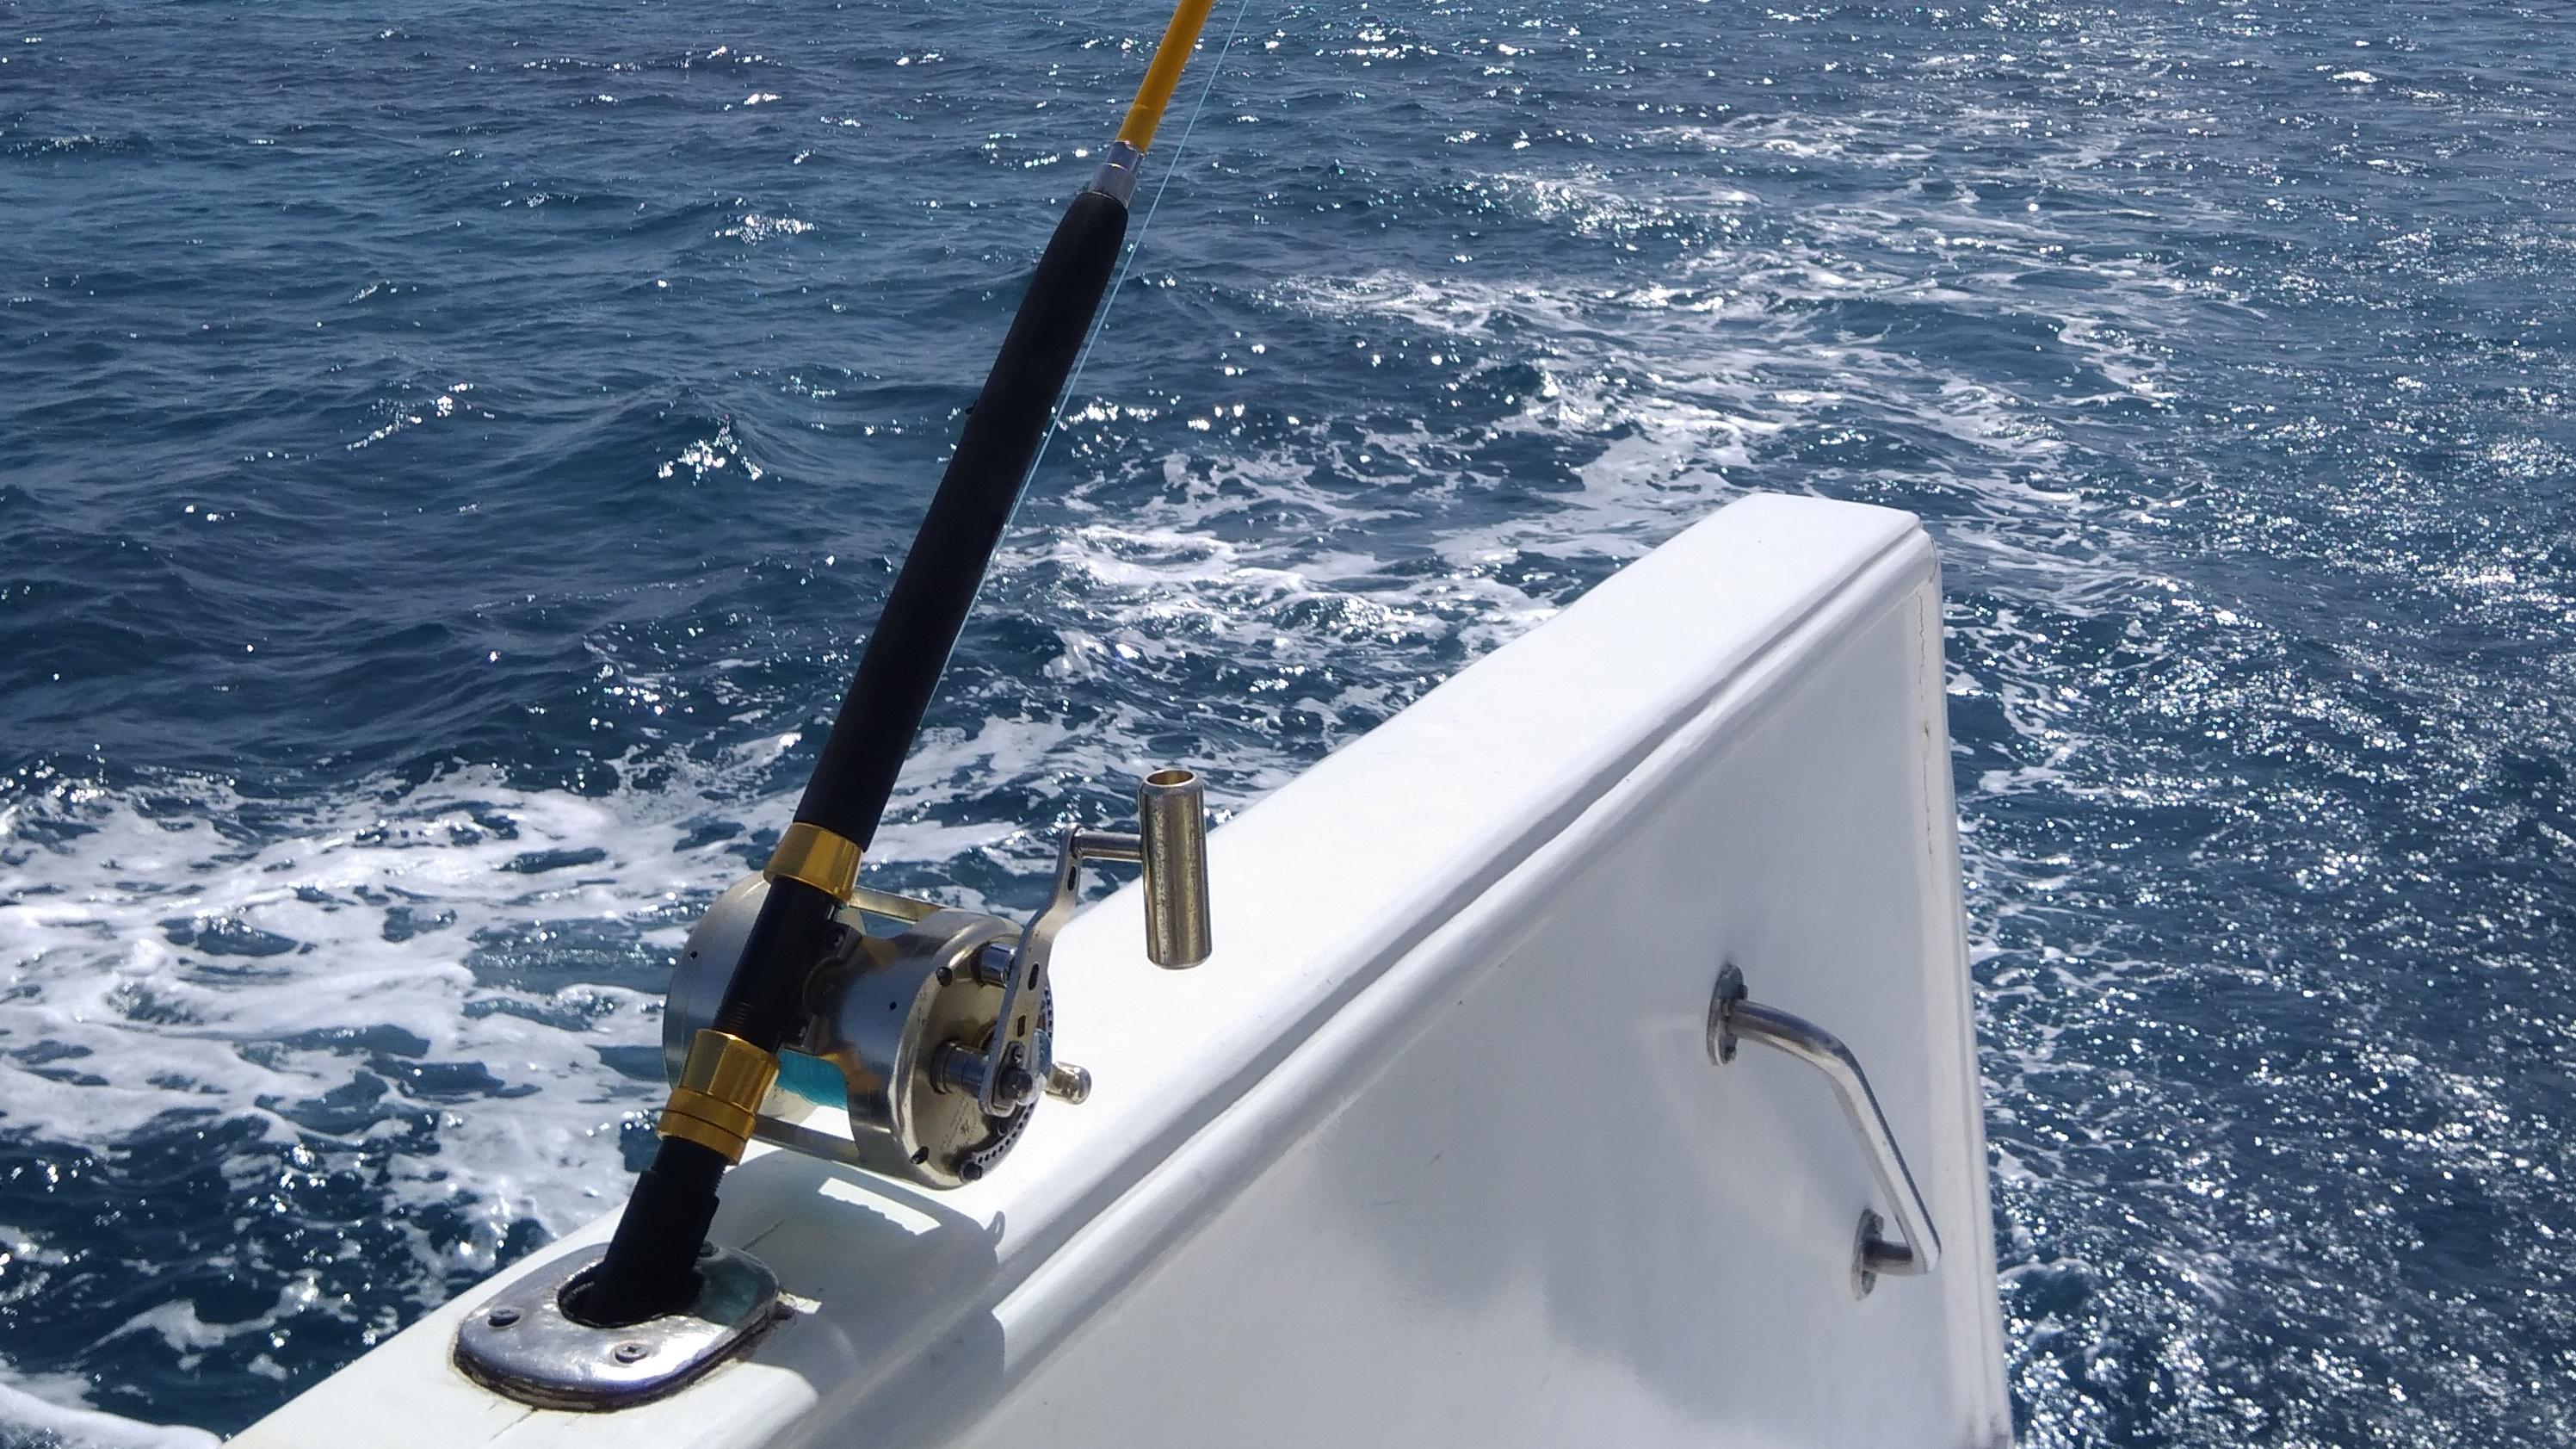 Voyage de pêche à Hurghada